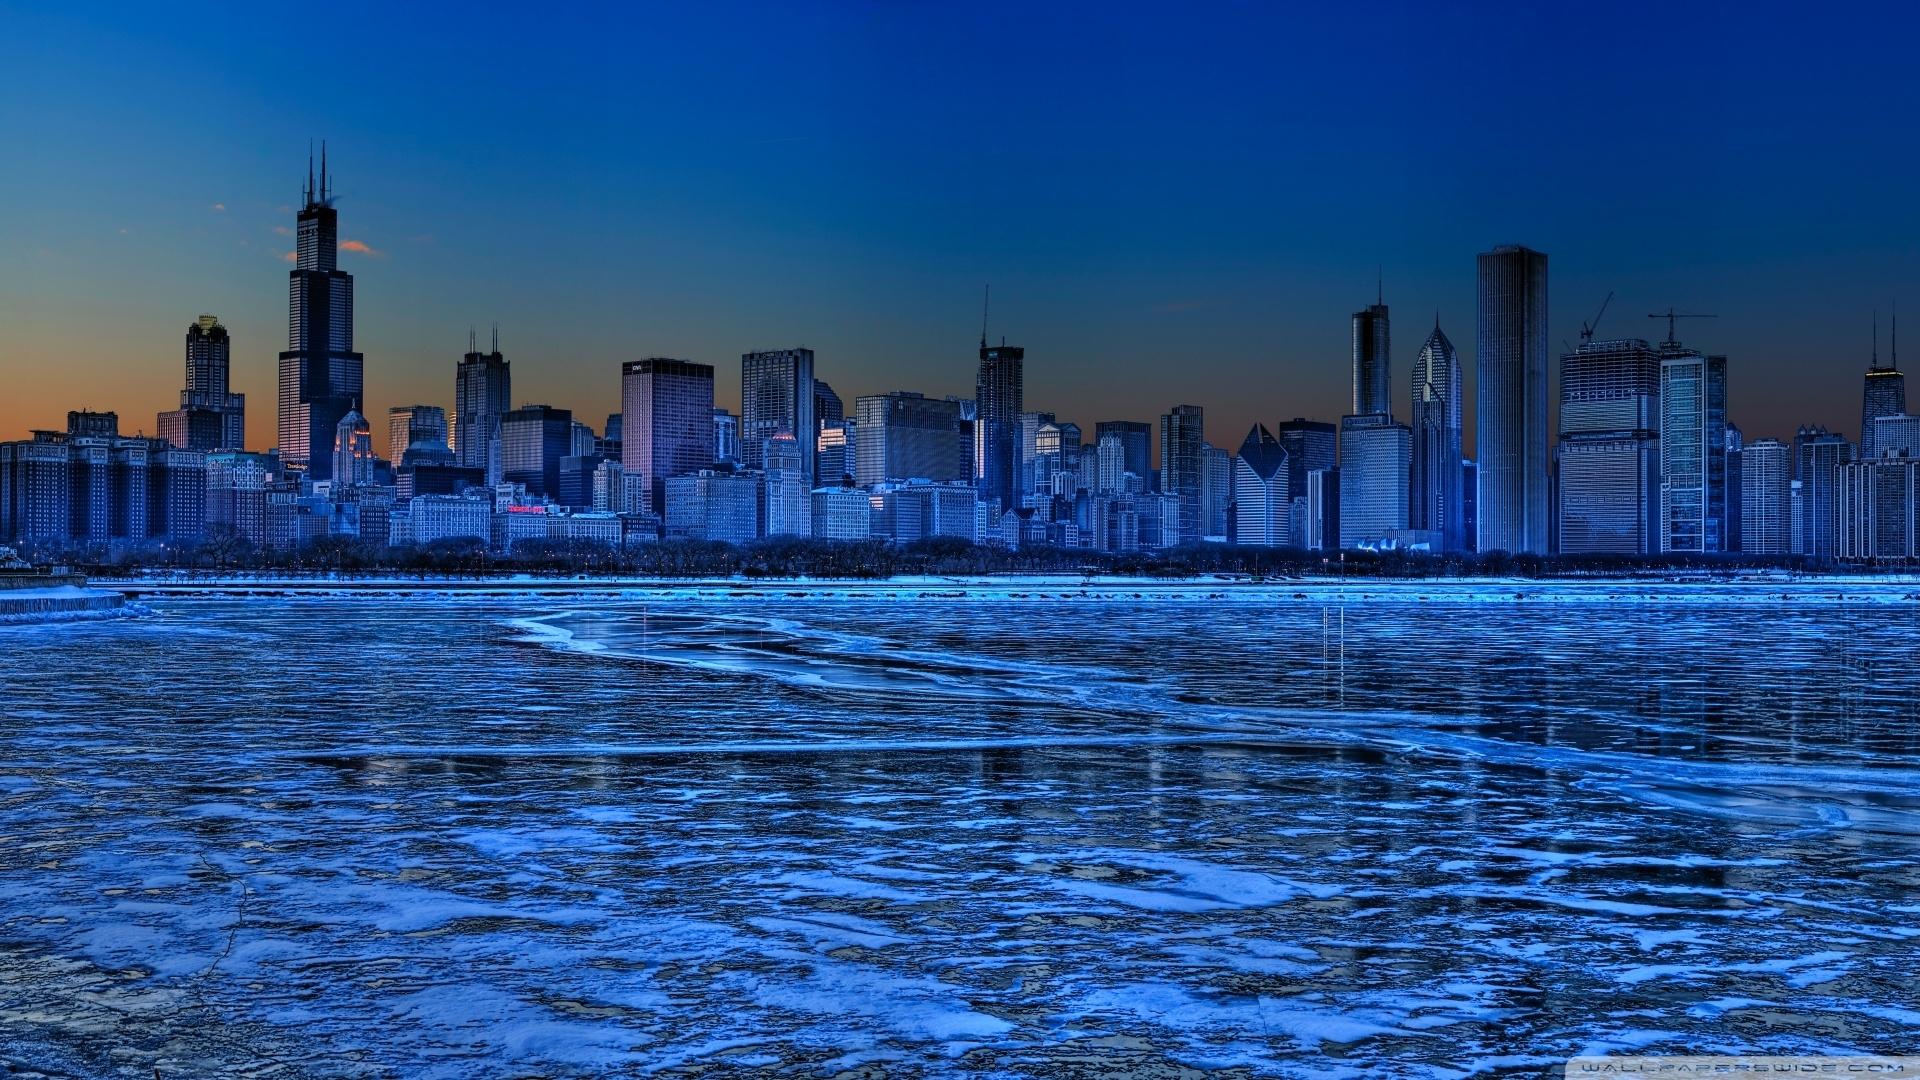 download chicago skyline 3 wallpaper 1920x1080 | wallpoper #444750